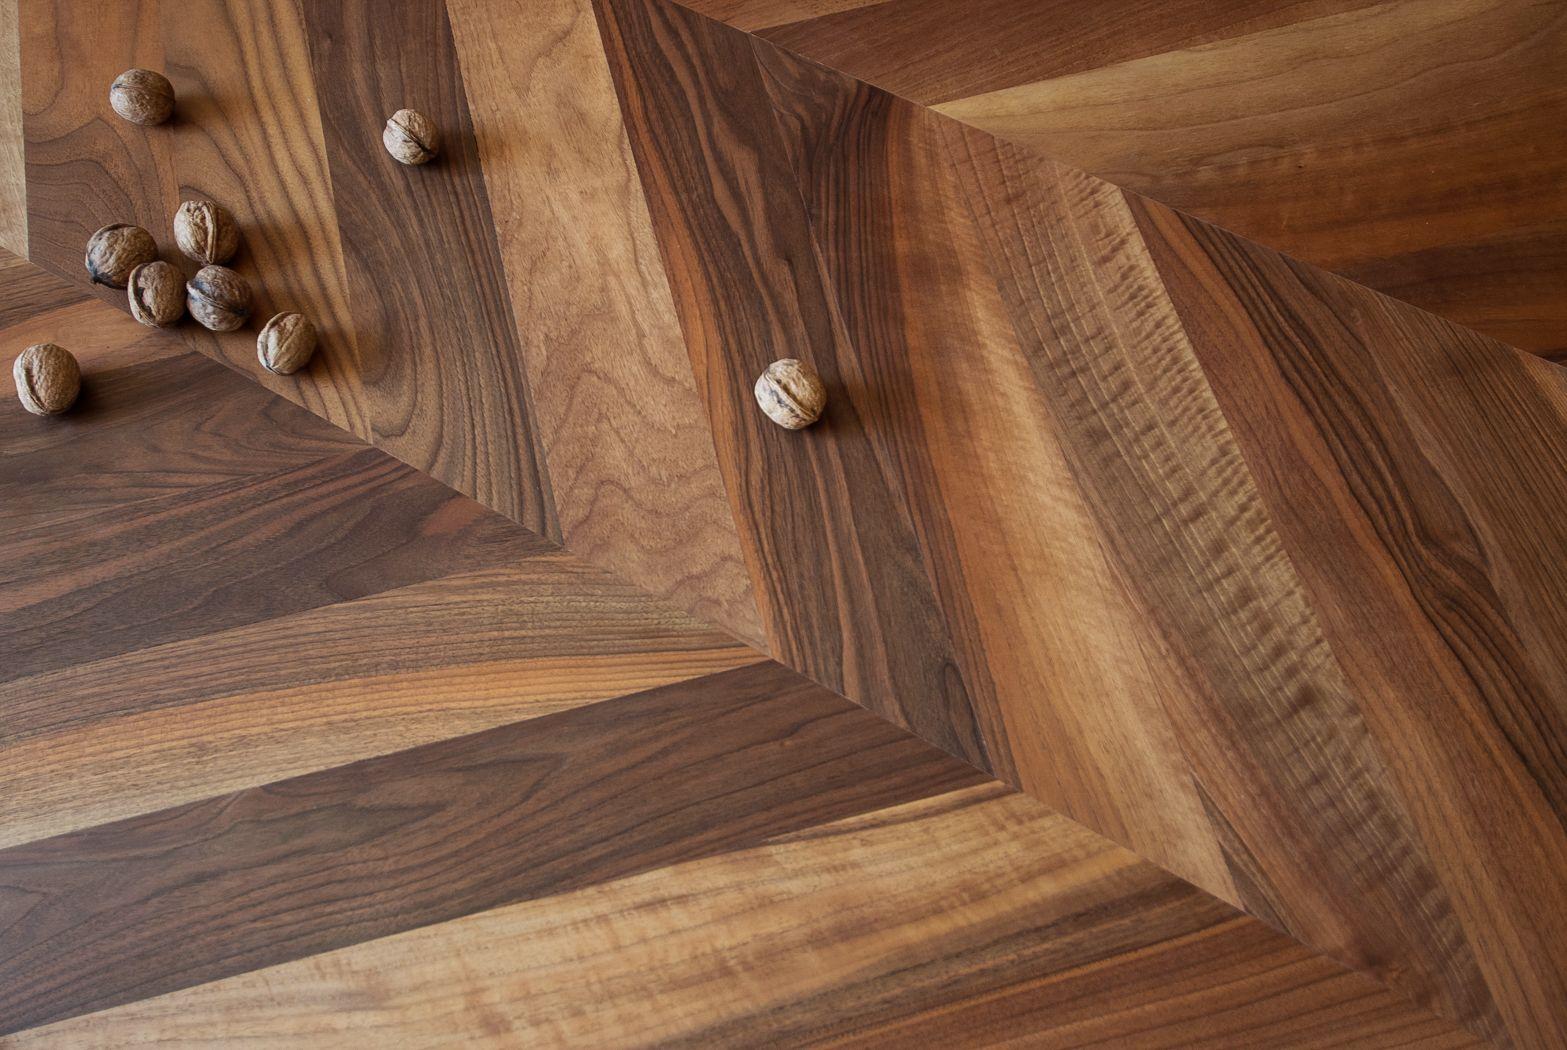 wood floor bevel floor fight flooring pear sapele wood floor wood wax wood floor russia oak wood floor wings wood flooring online with 5657square meter